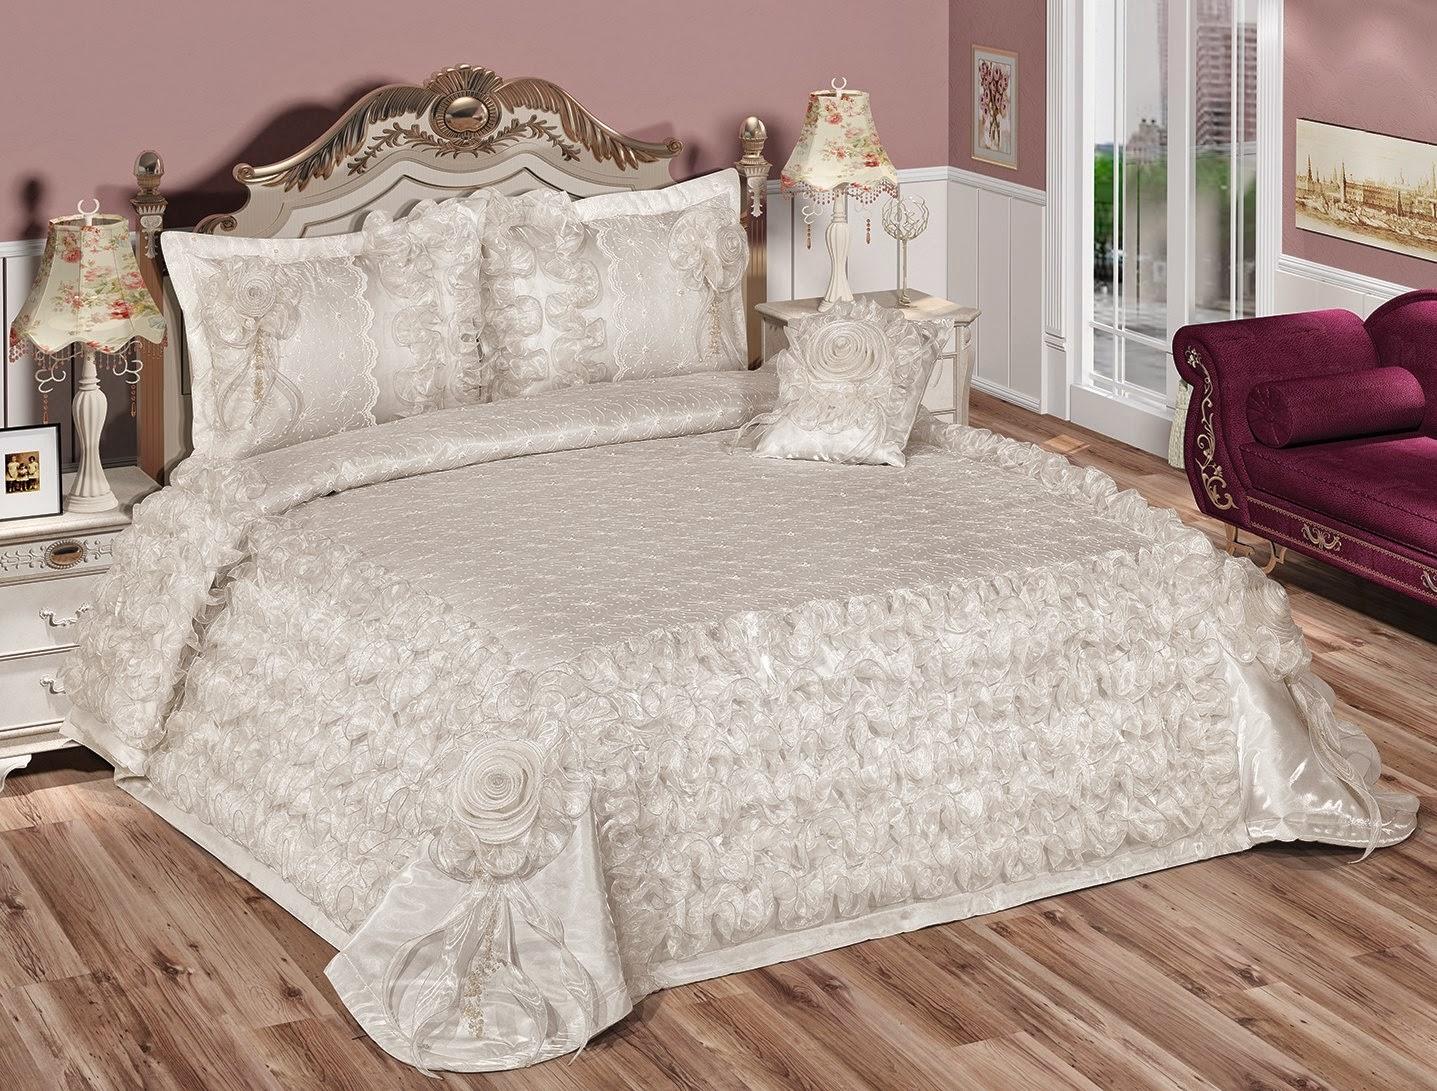 colcha branca+ 2 porta travesseiro+2 almofadas de rosas+ 3 tapetes